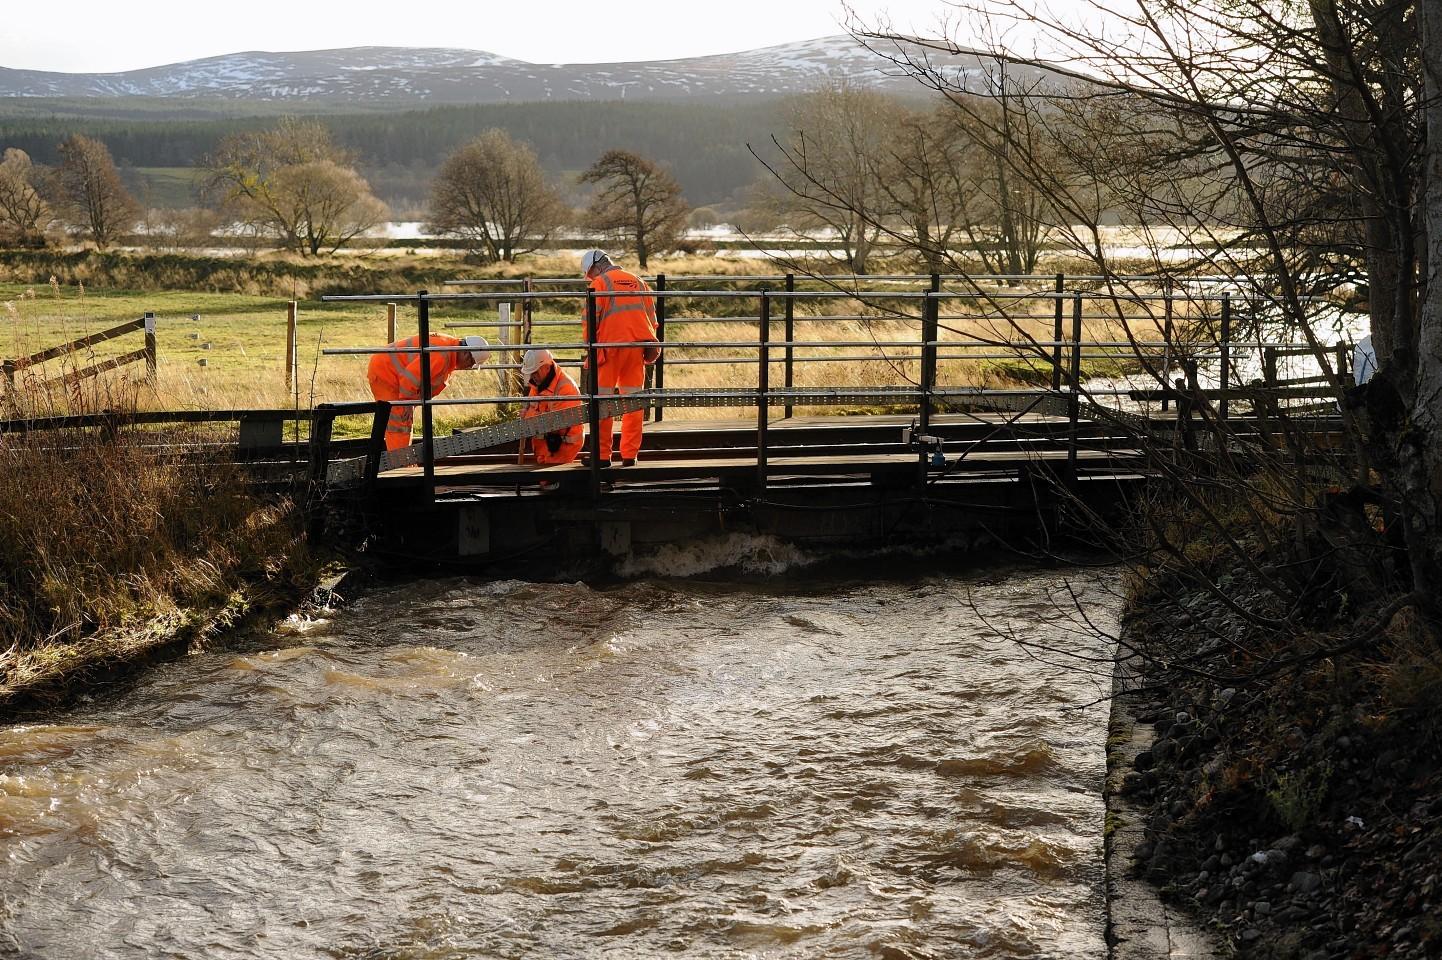 Engineers examine the rail track near Kingussie after flood concerns